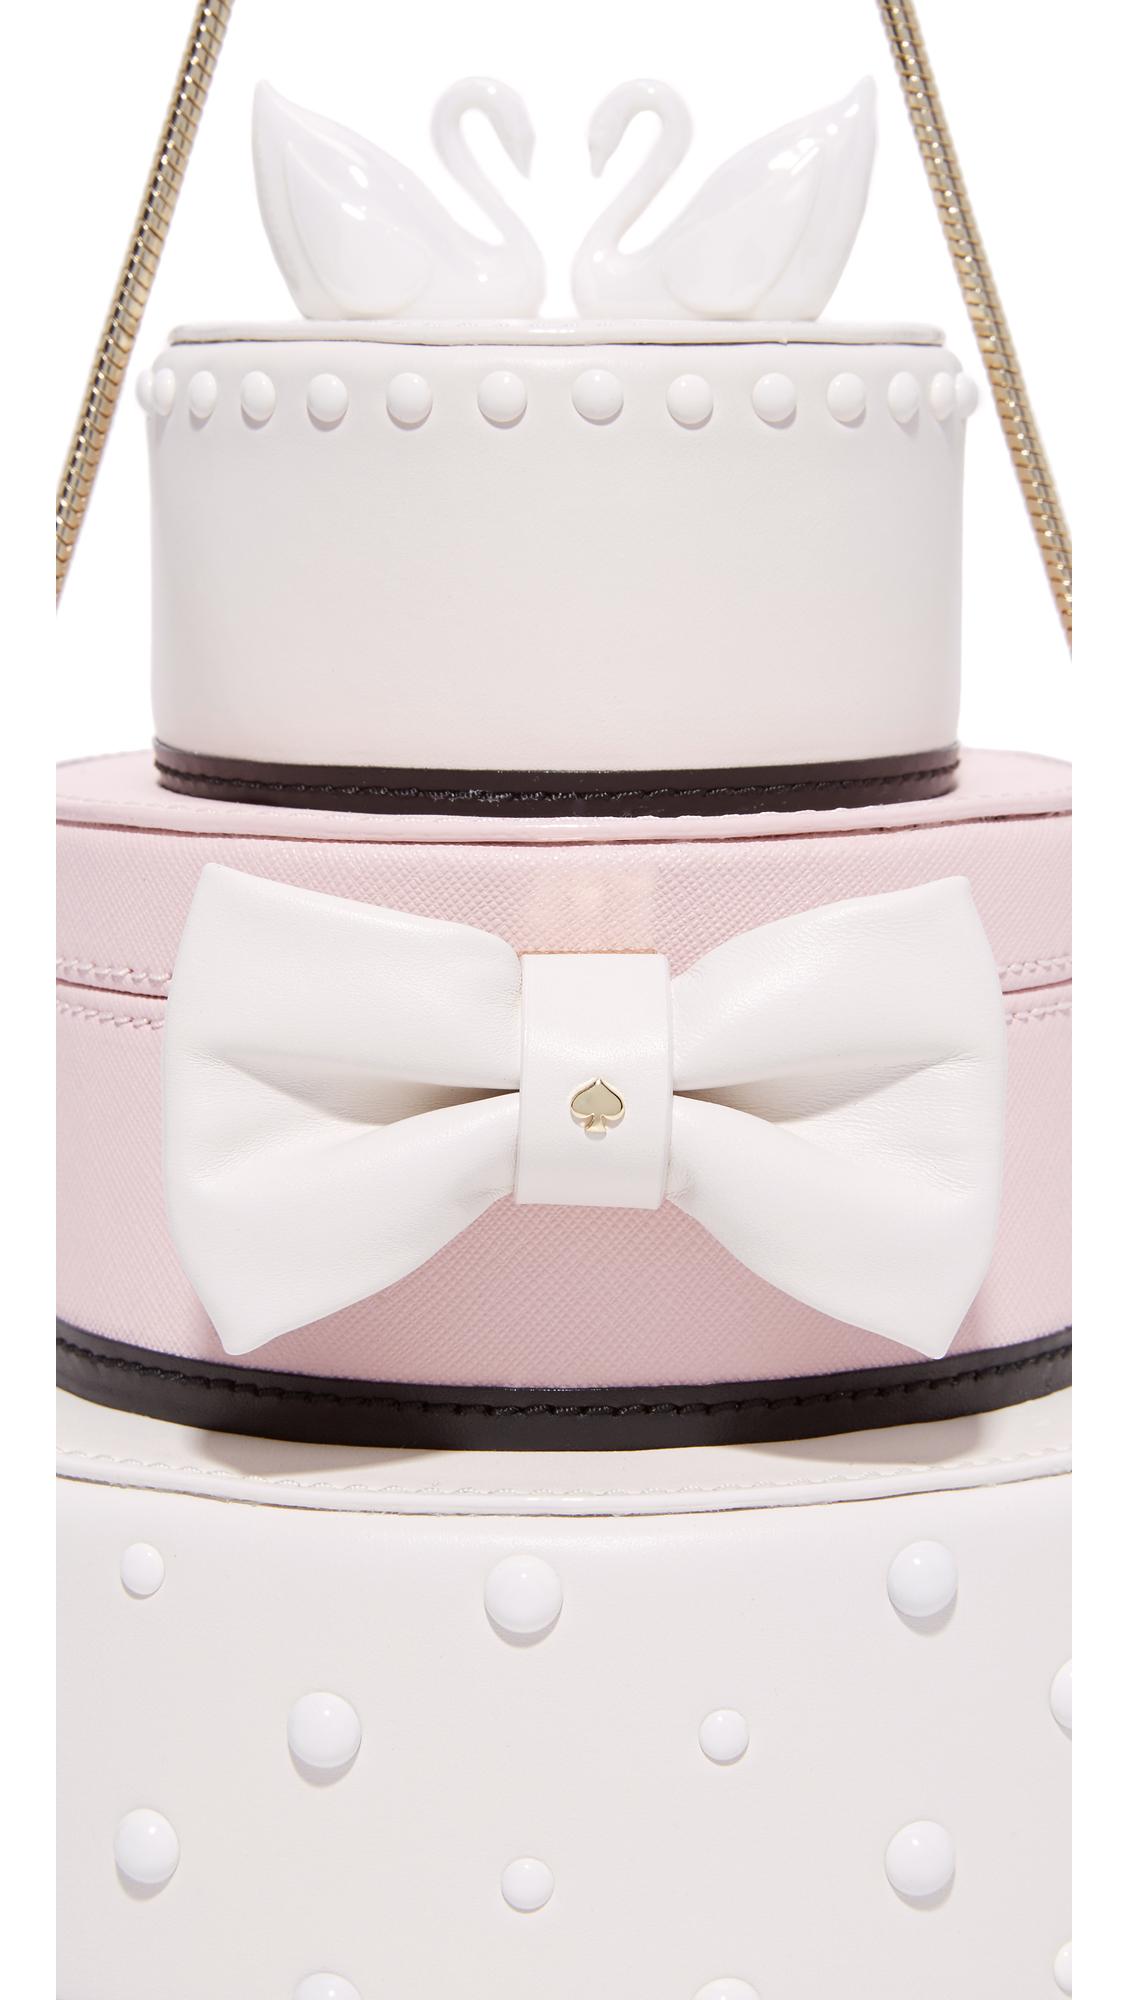 Kate Spade New York 3D Cake Clutch   SHOPBOP